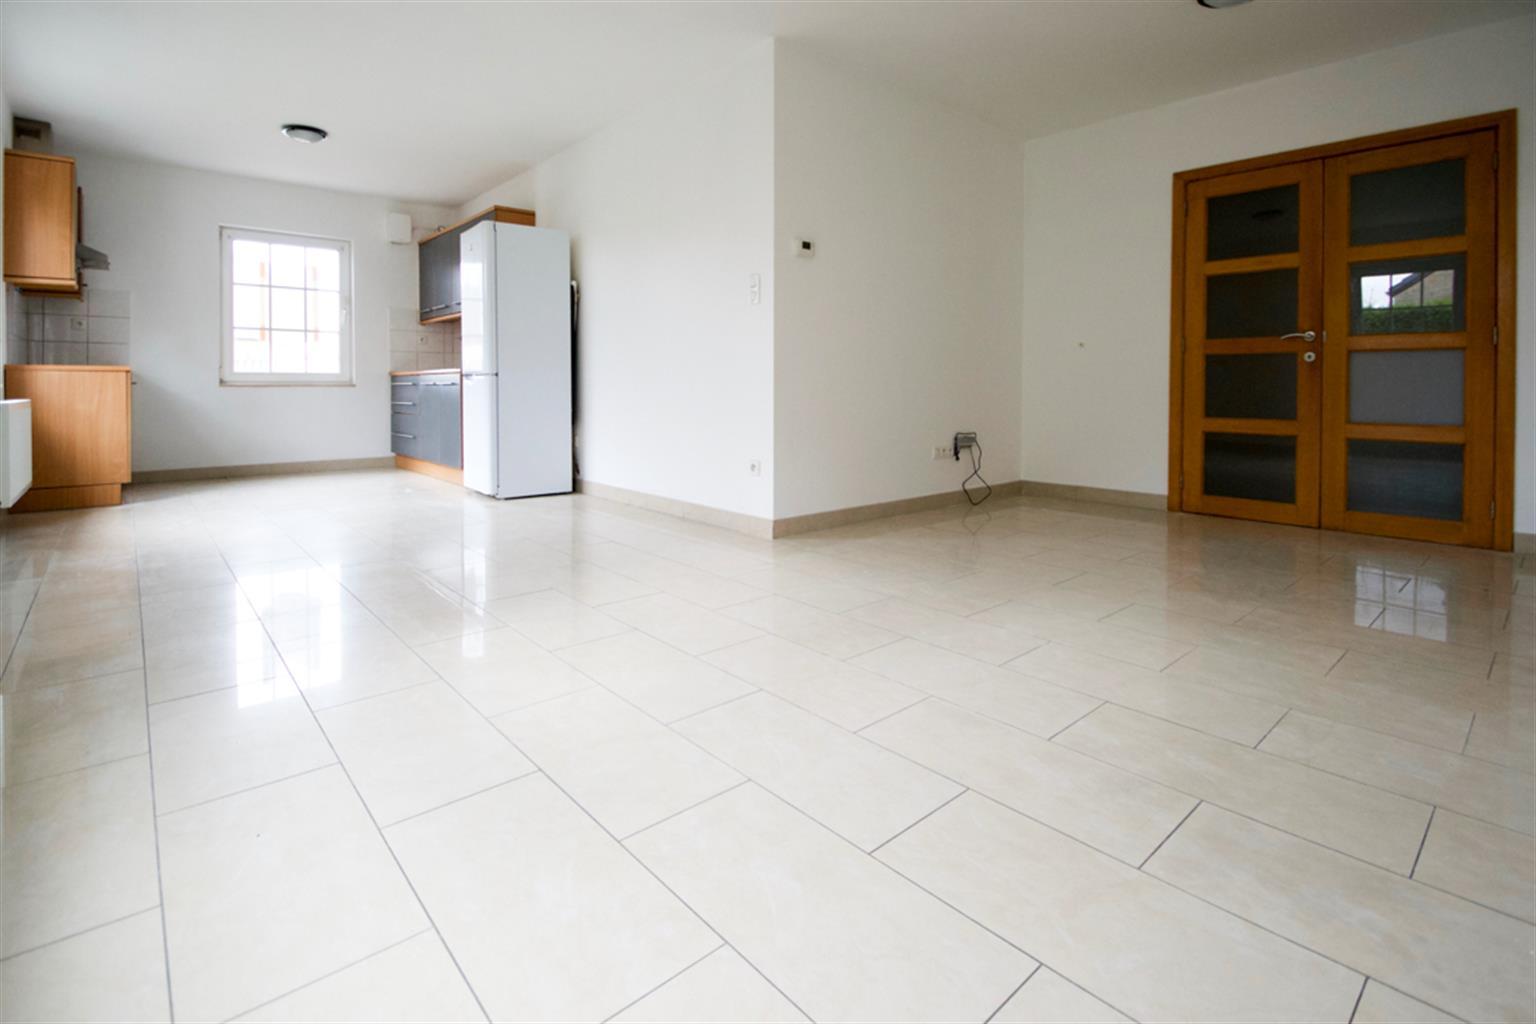 Appartement - Binche Leval-Trahegnies - #3734770-2